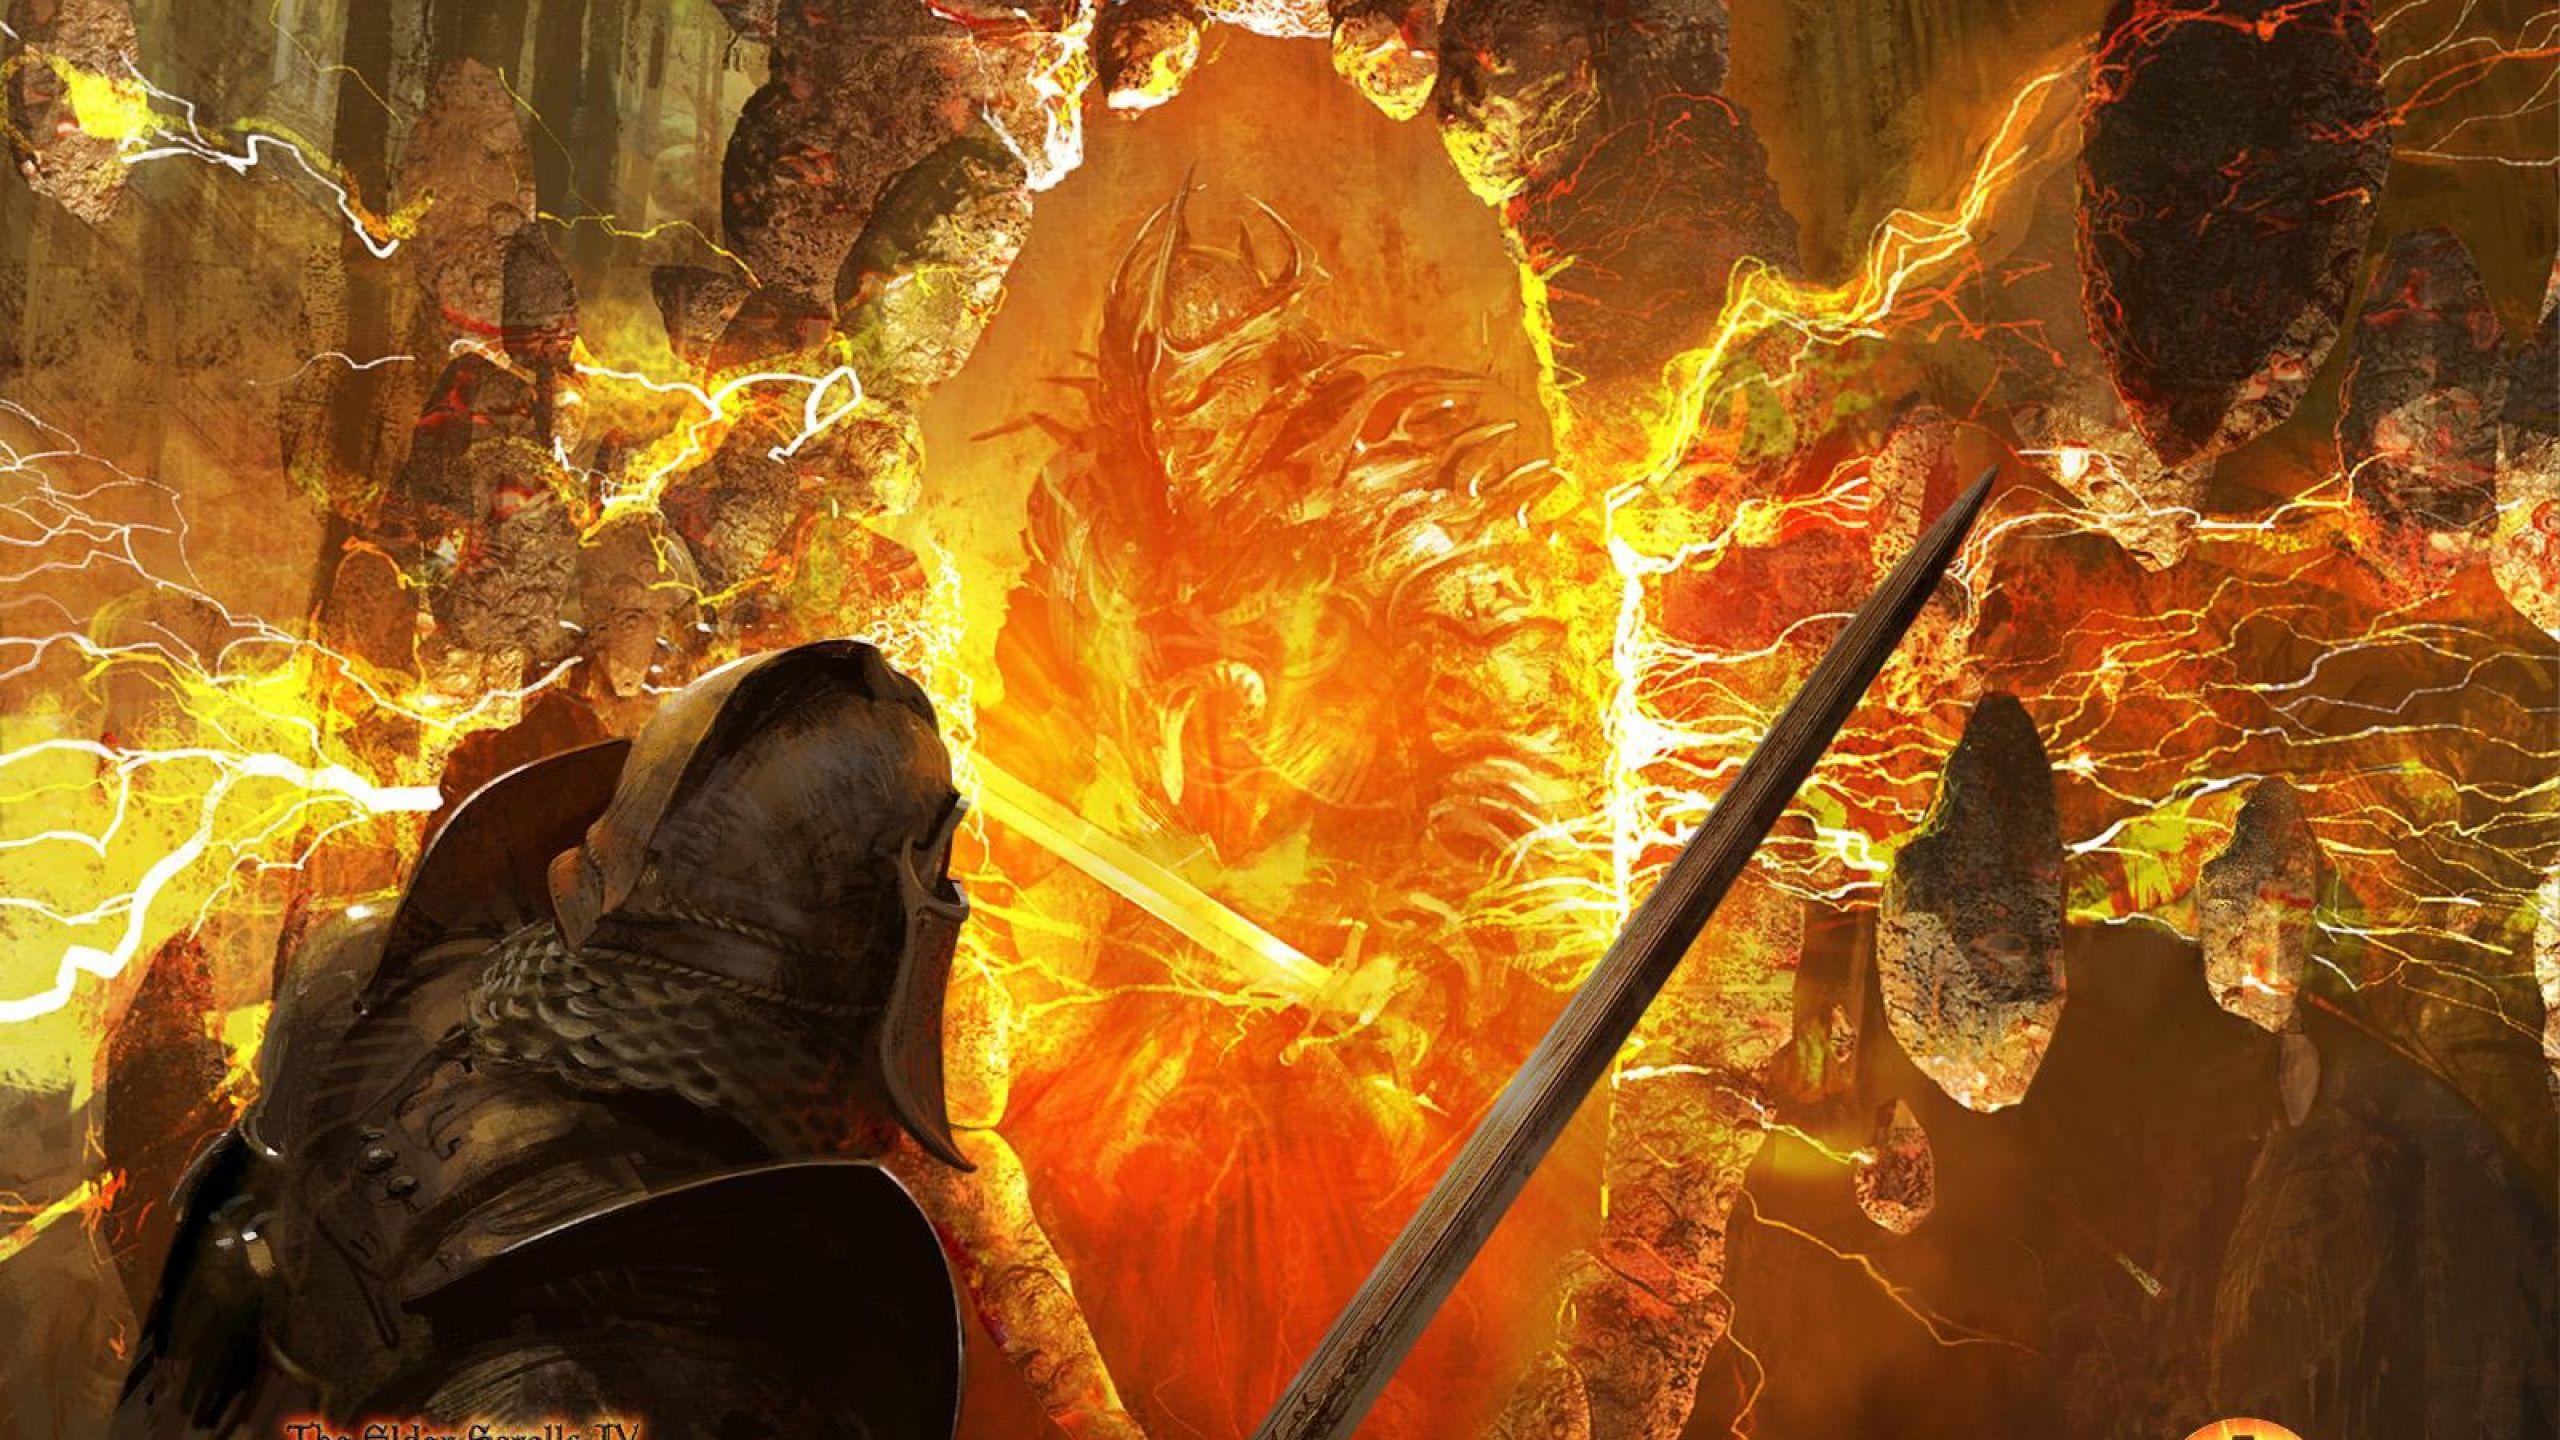 The Elder Scrolls IV: Oblivion clipart #11, Download drawings